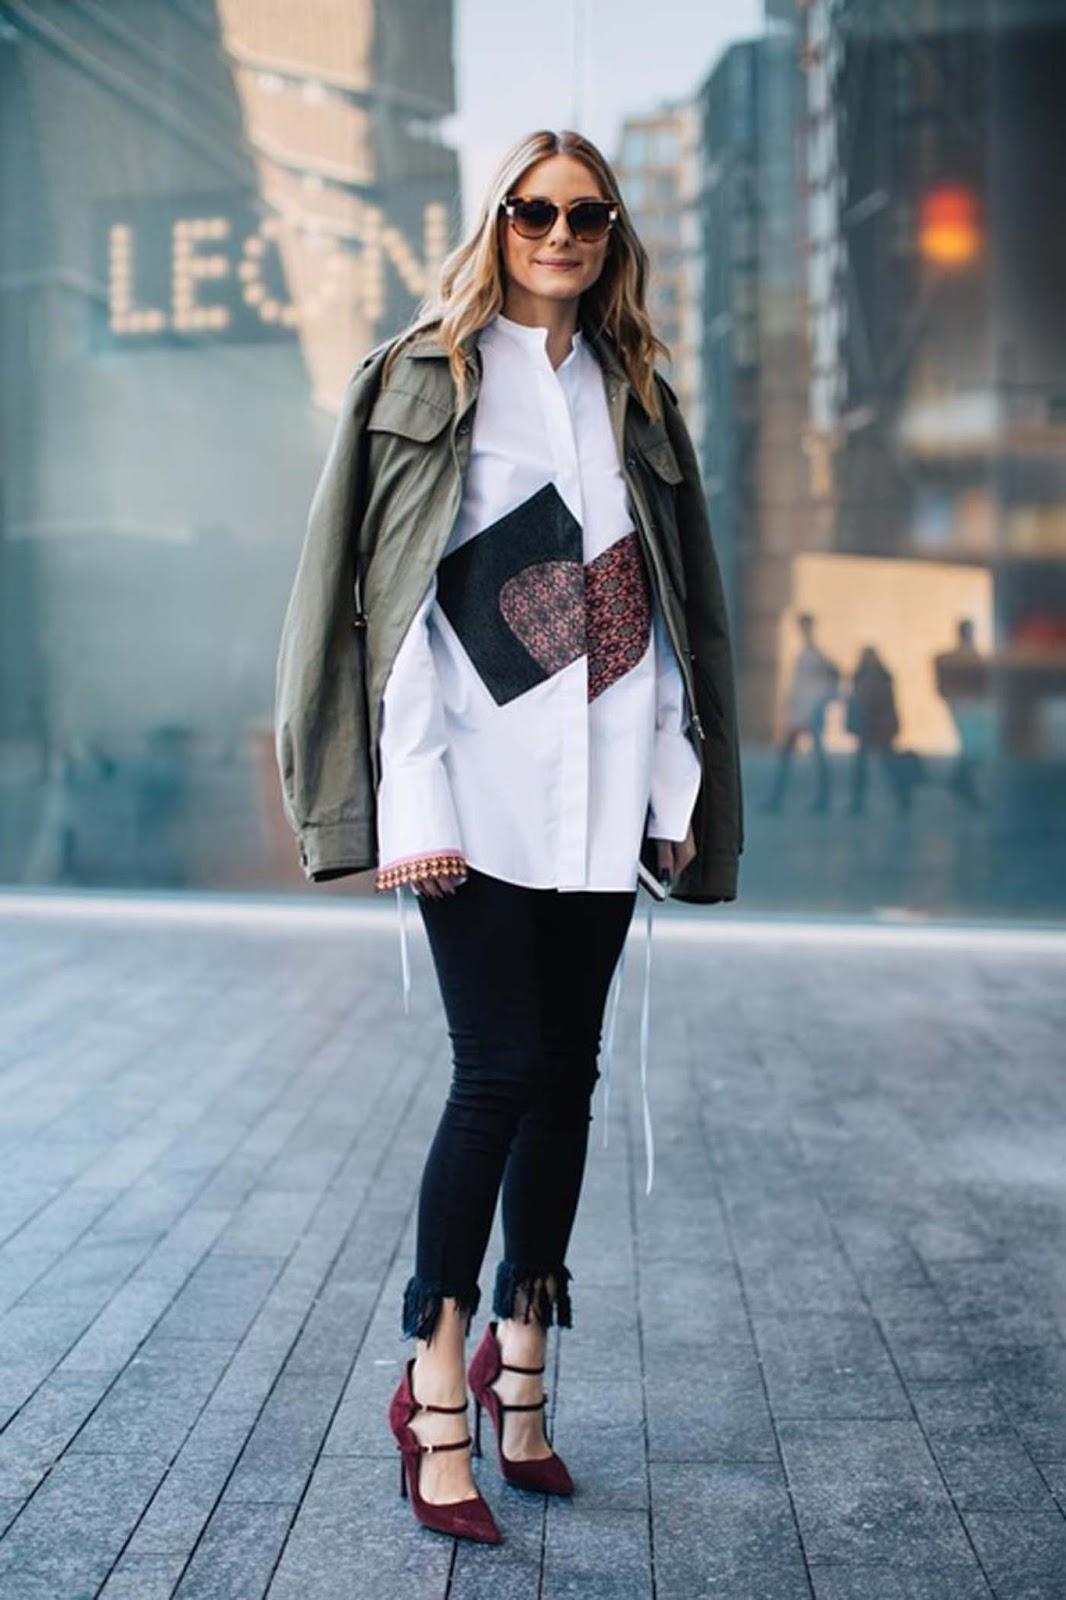 Eniwhere Fashion - Sfilate - Street style